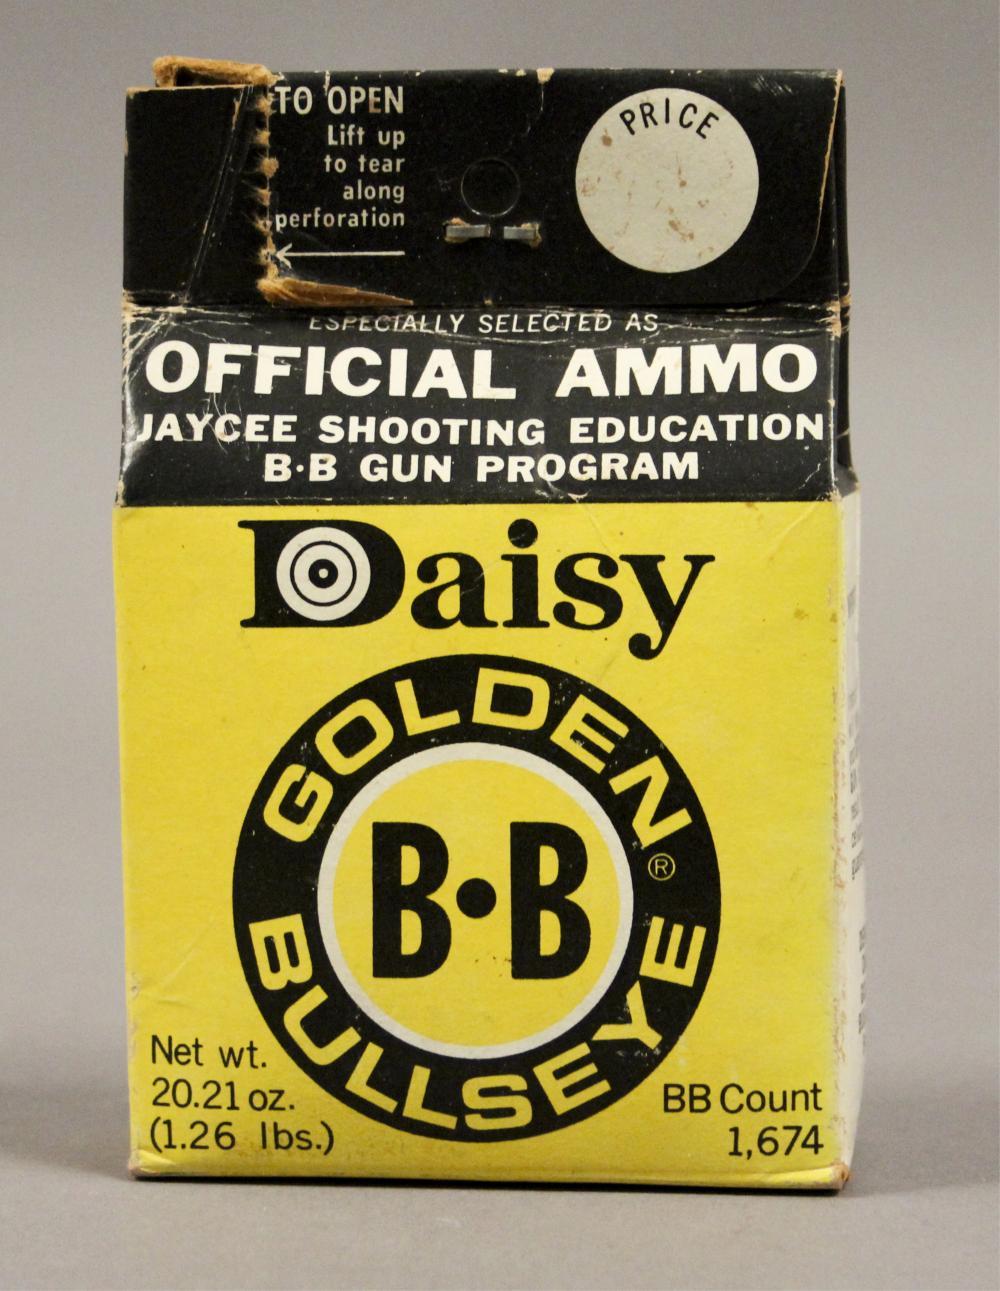 Daisy Heddon Model #102 BB Gun with BB Pellets